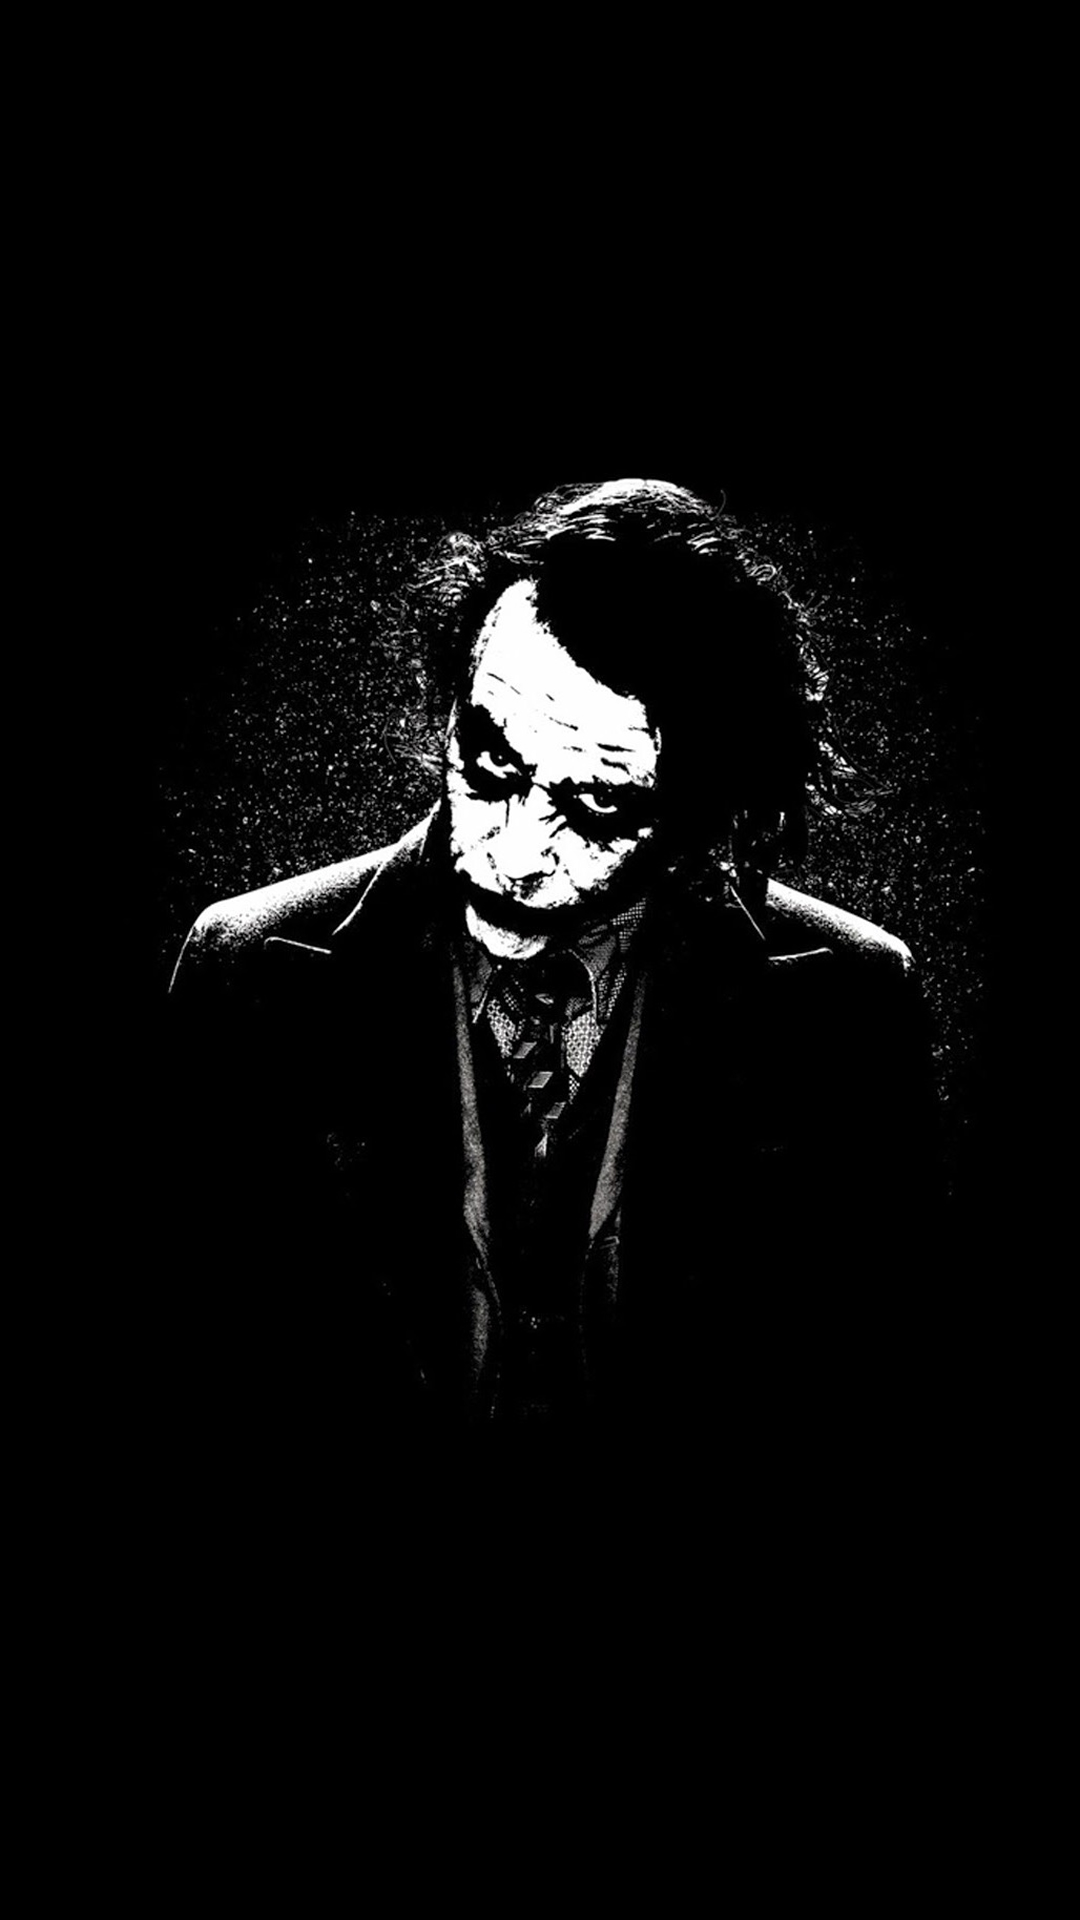 Batman Black White iPhone 6 Wallpaper Download iPhone Wallpapers 1080x1920